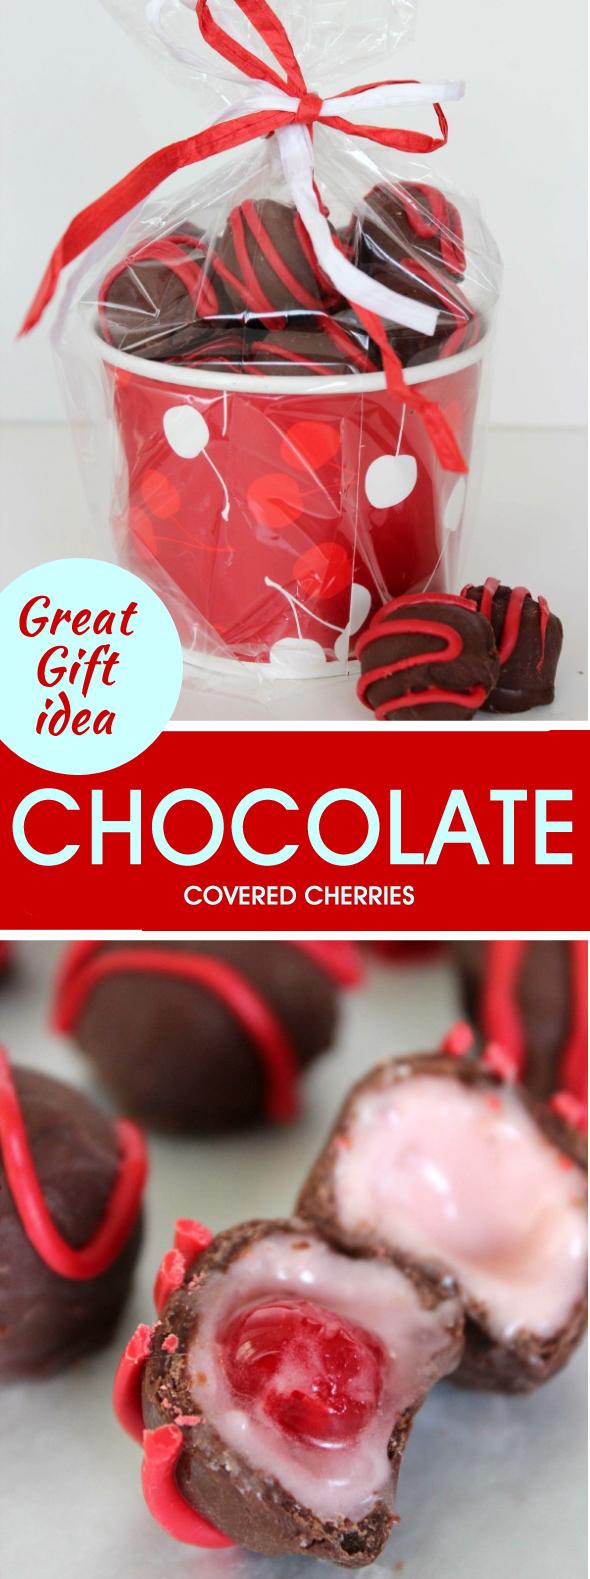 CHOCOLATE COVERED CHERRIES RECIPE #dessert #candy